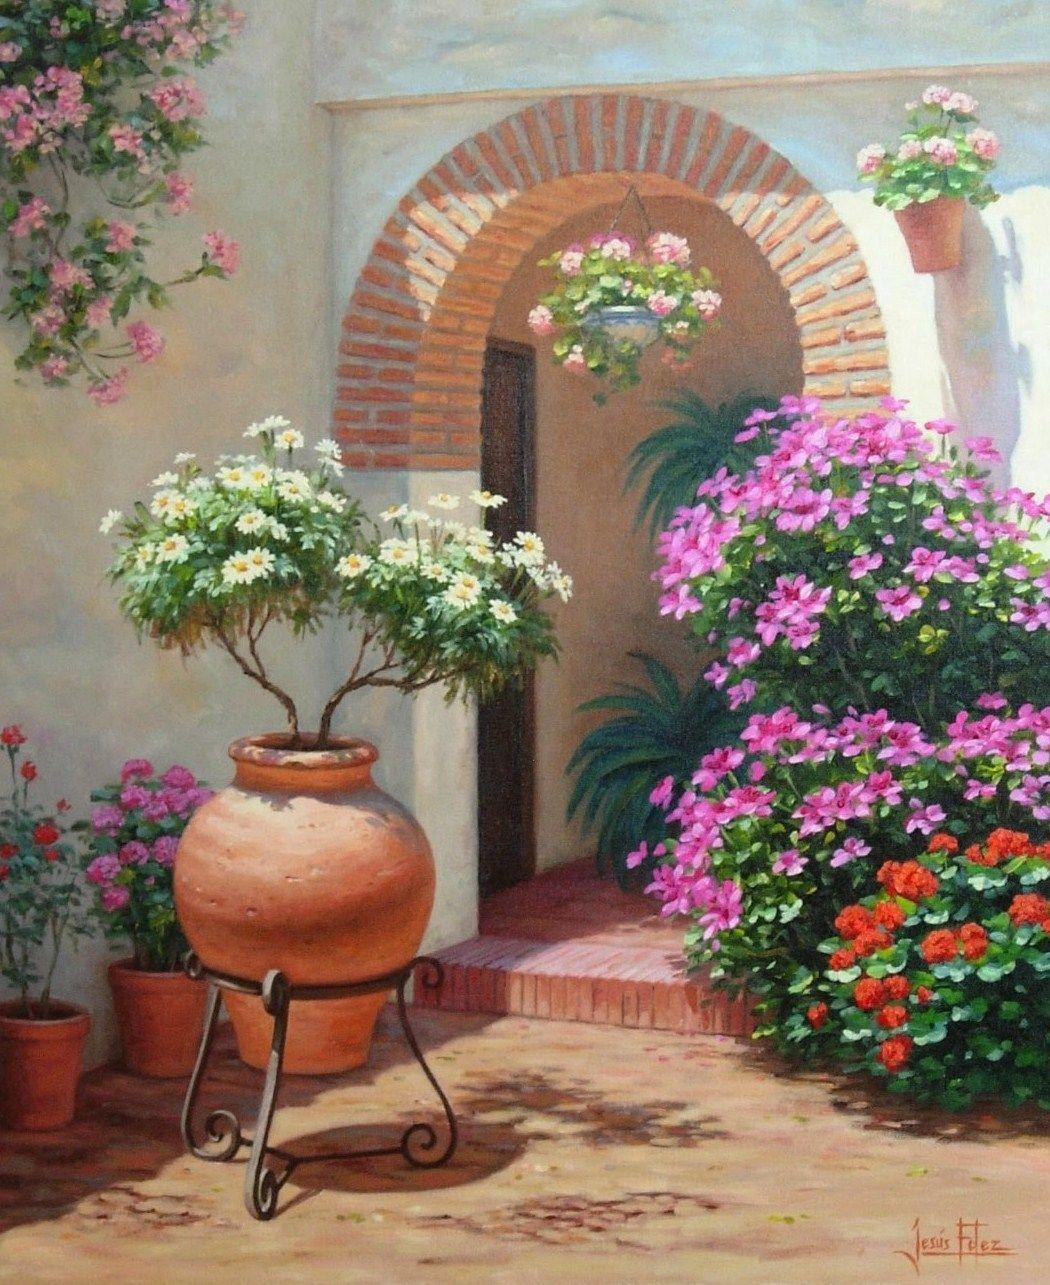 Pintura y fotograf a art stica paisajes con flores for Decoracion y paisaje s a